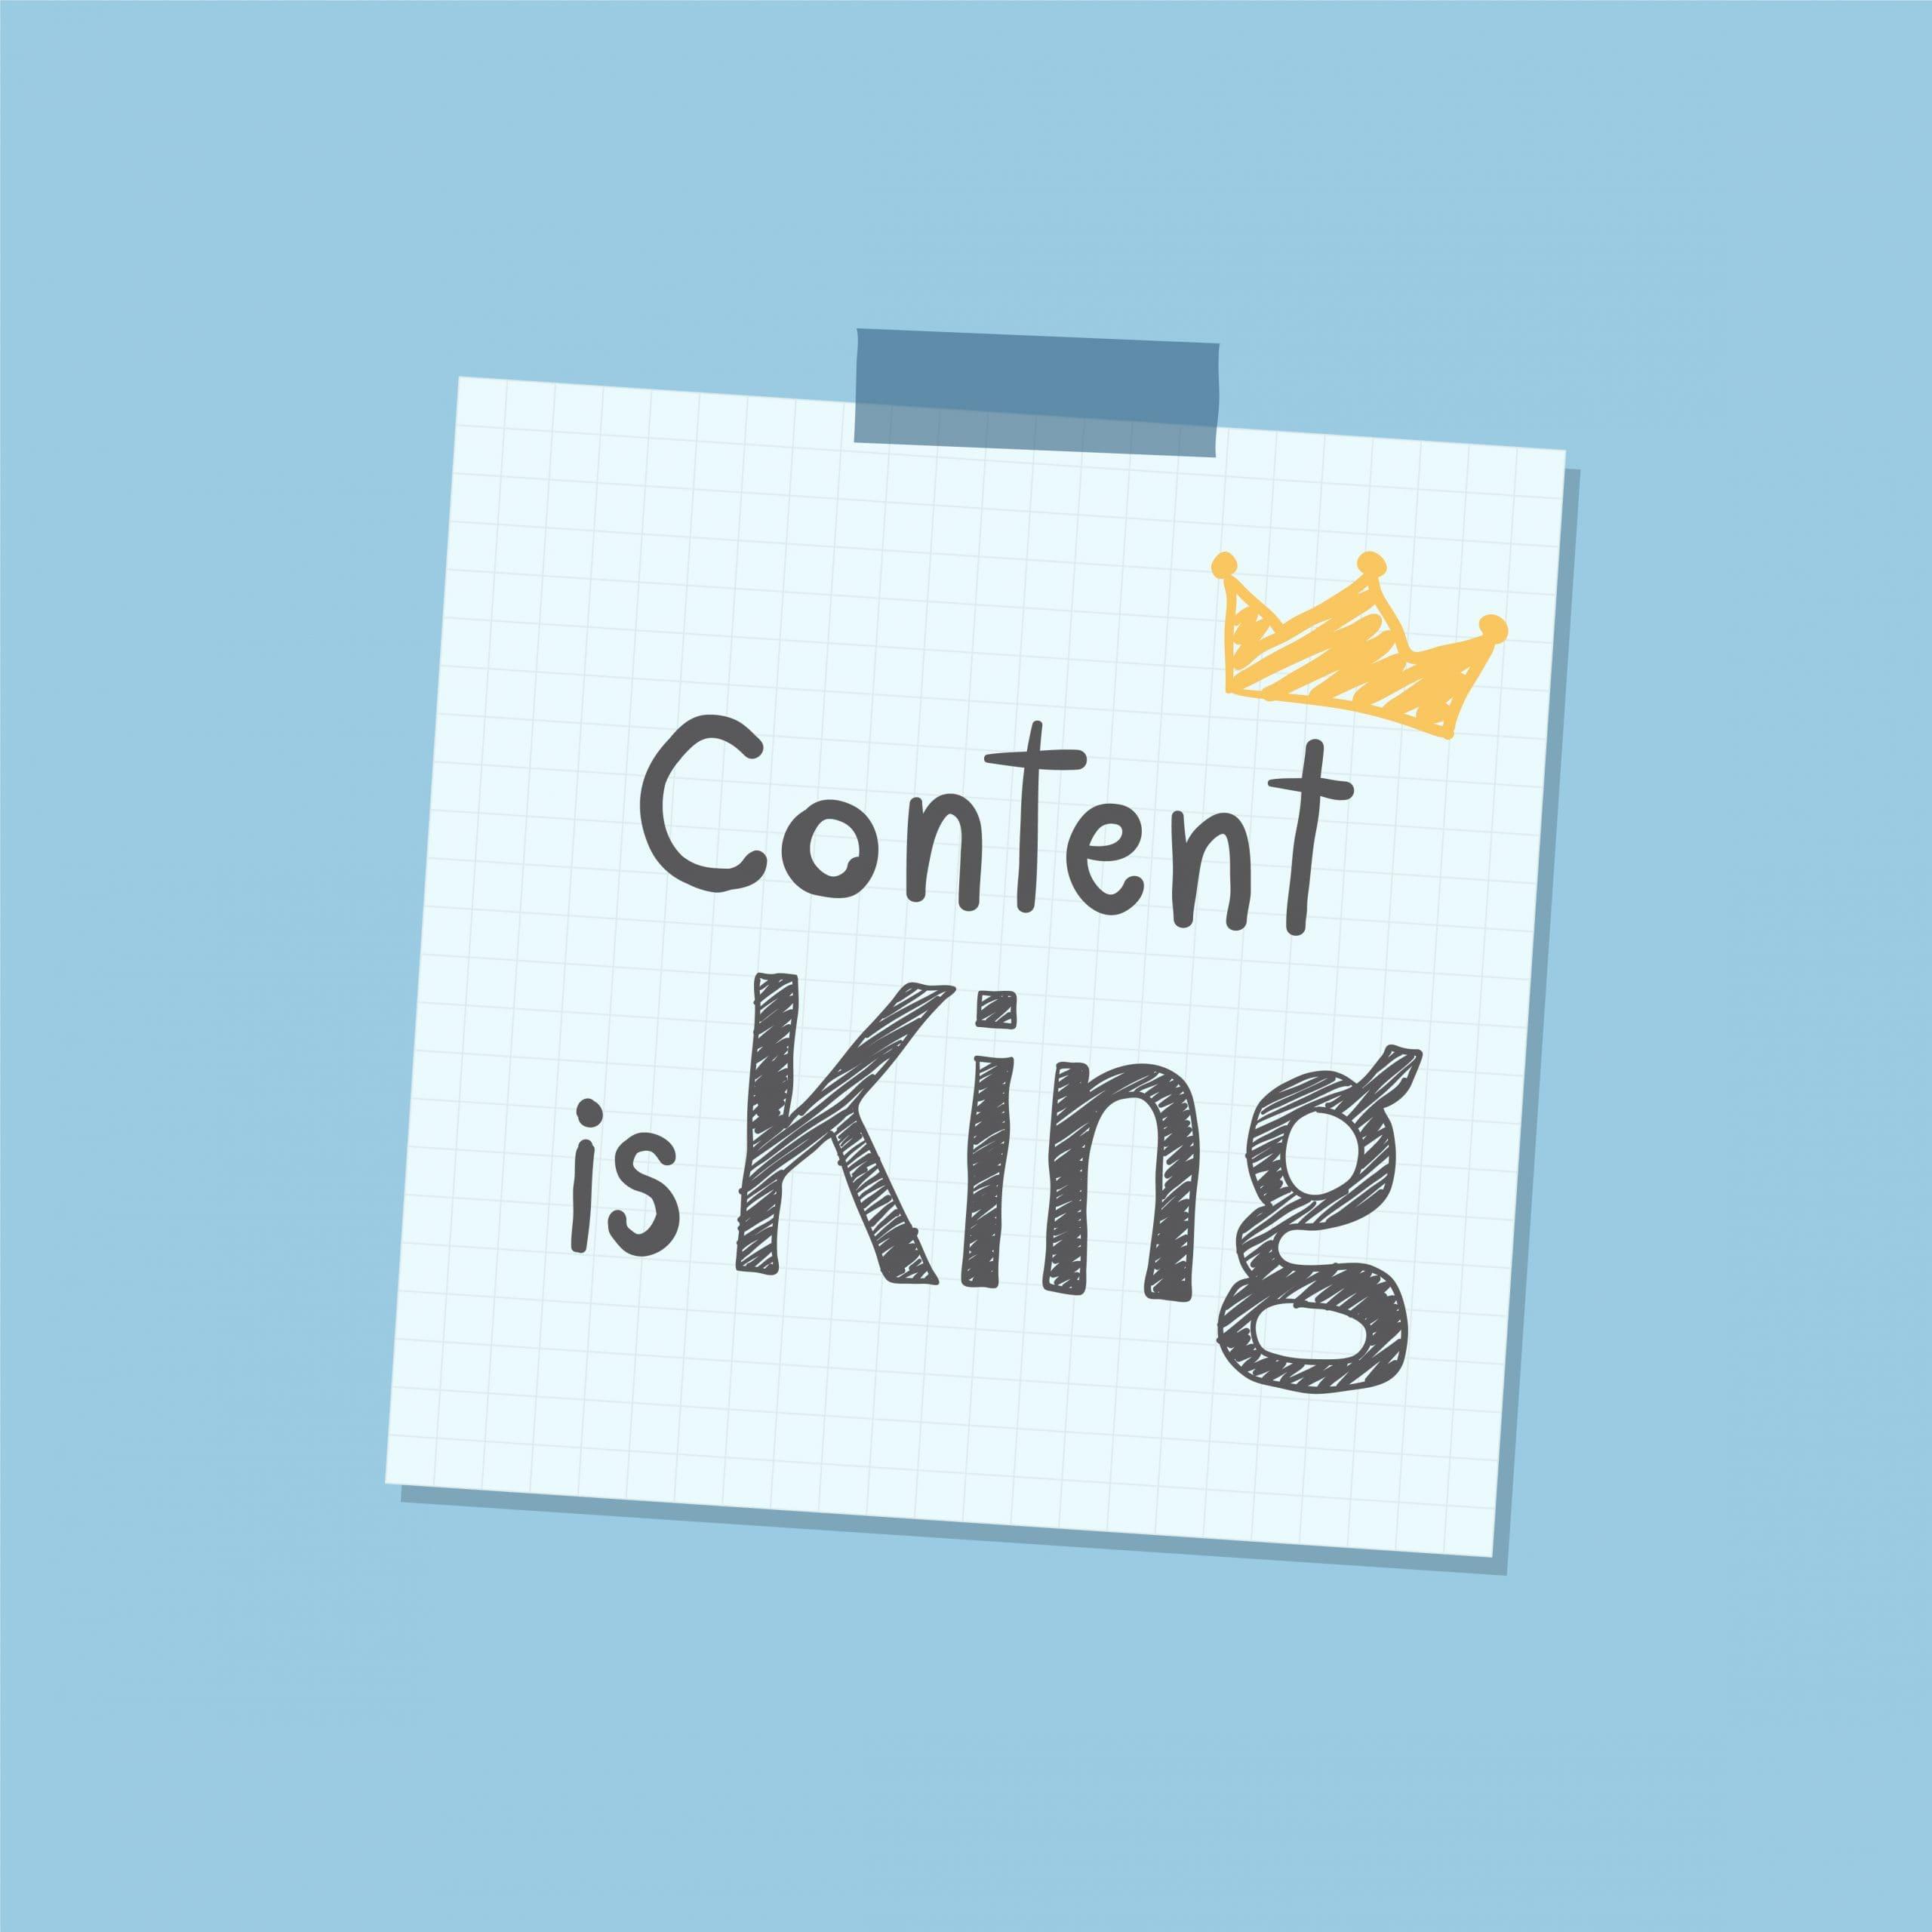 ContentKing: de real-time SEO marketingtool voor 24/7 monitoring